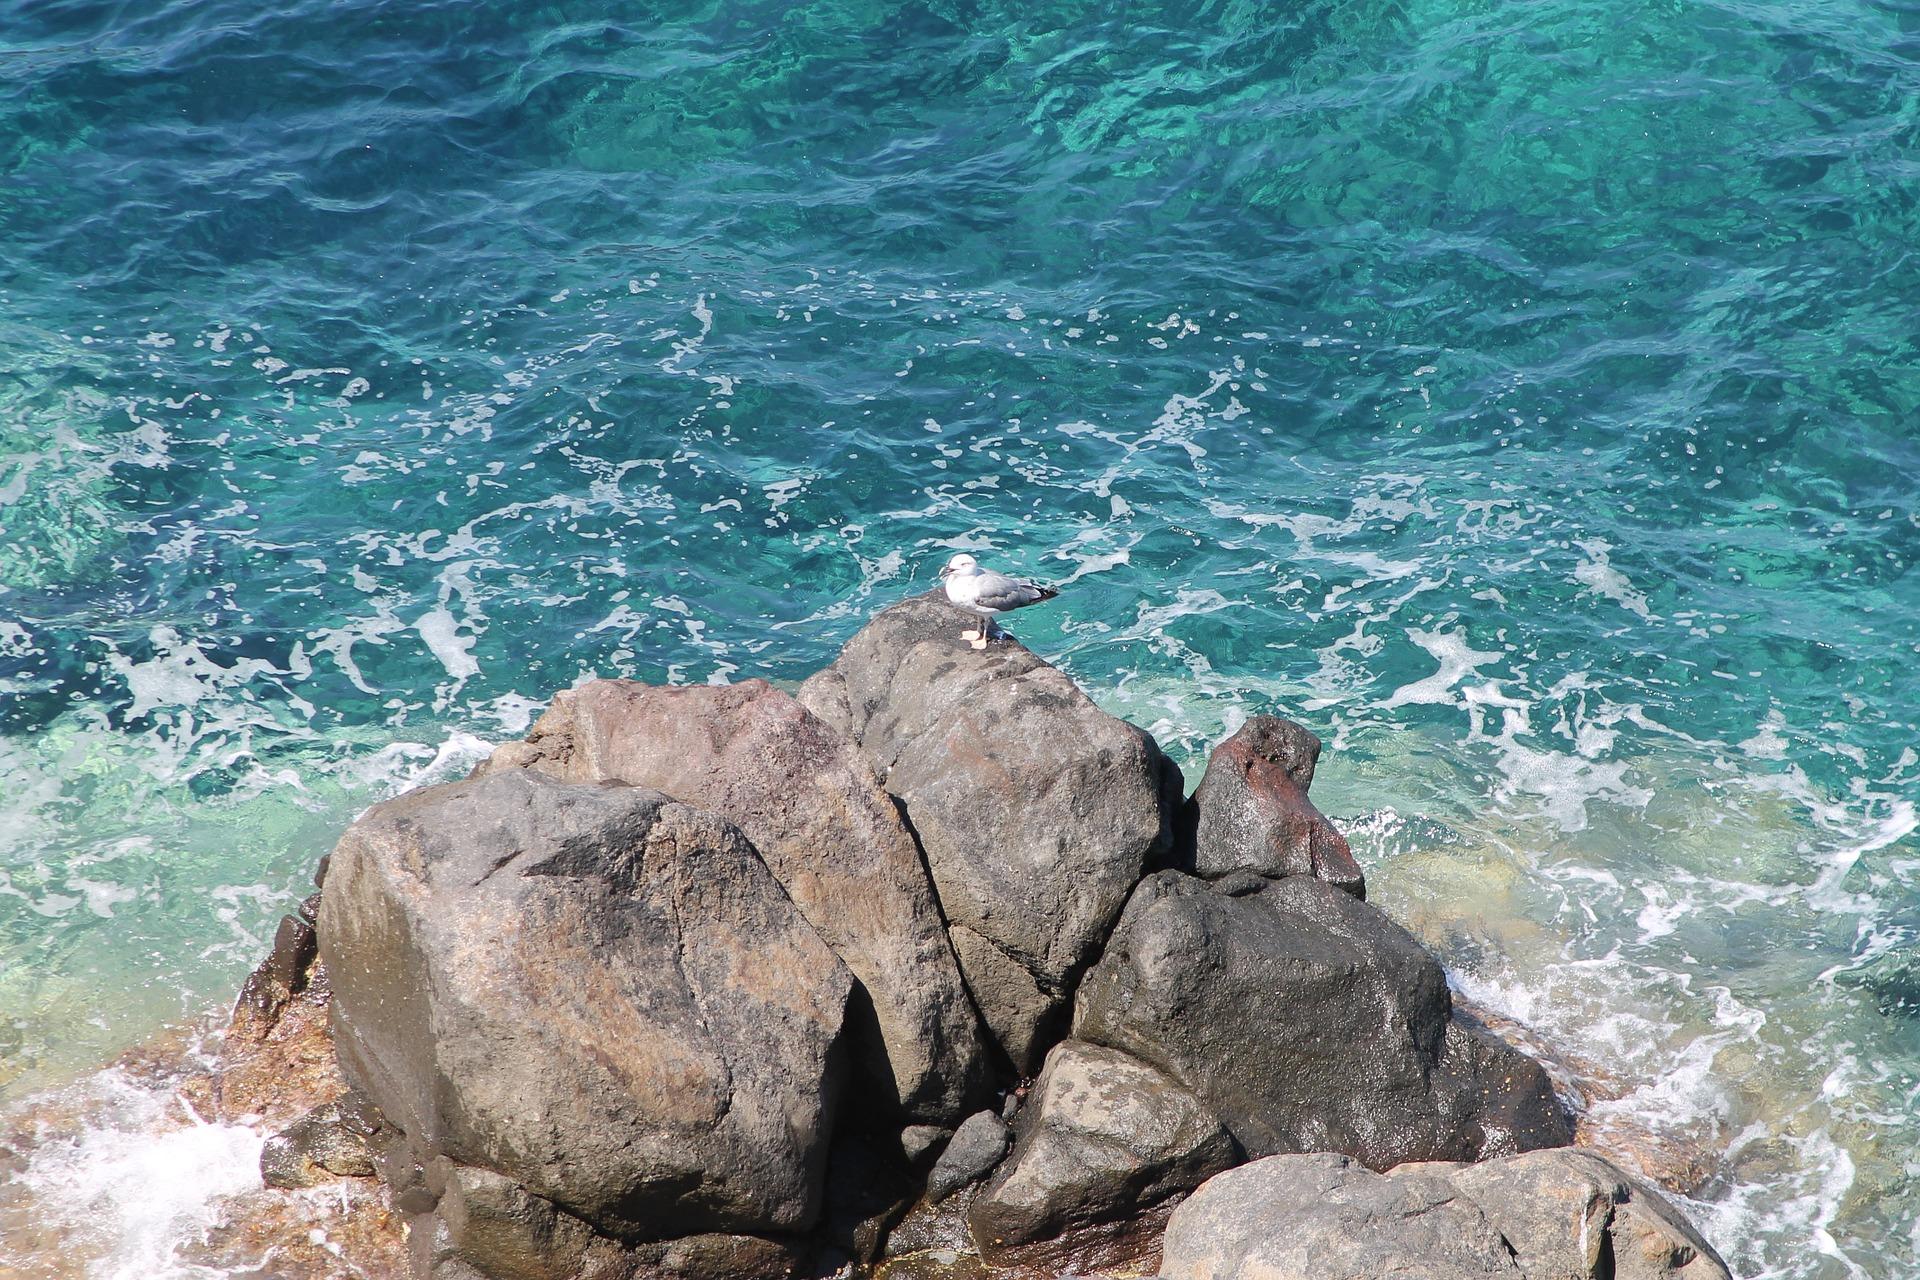 Isola di Capraia, Arcipelago Toscano